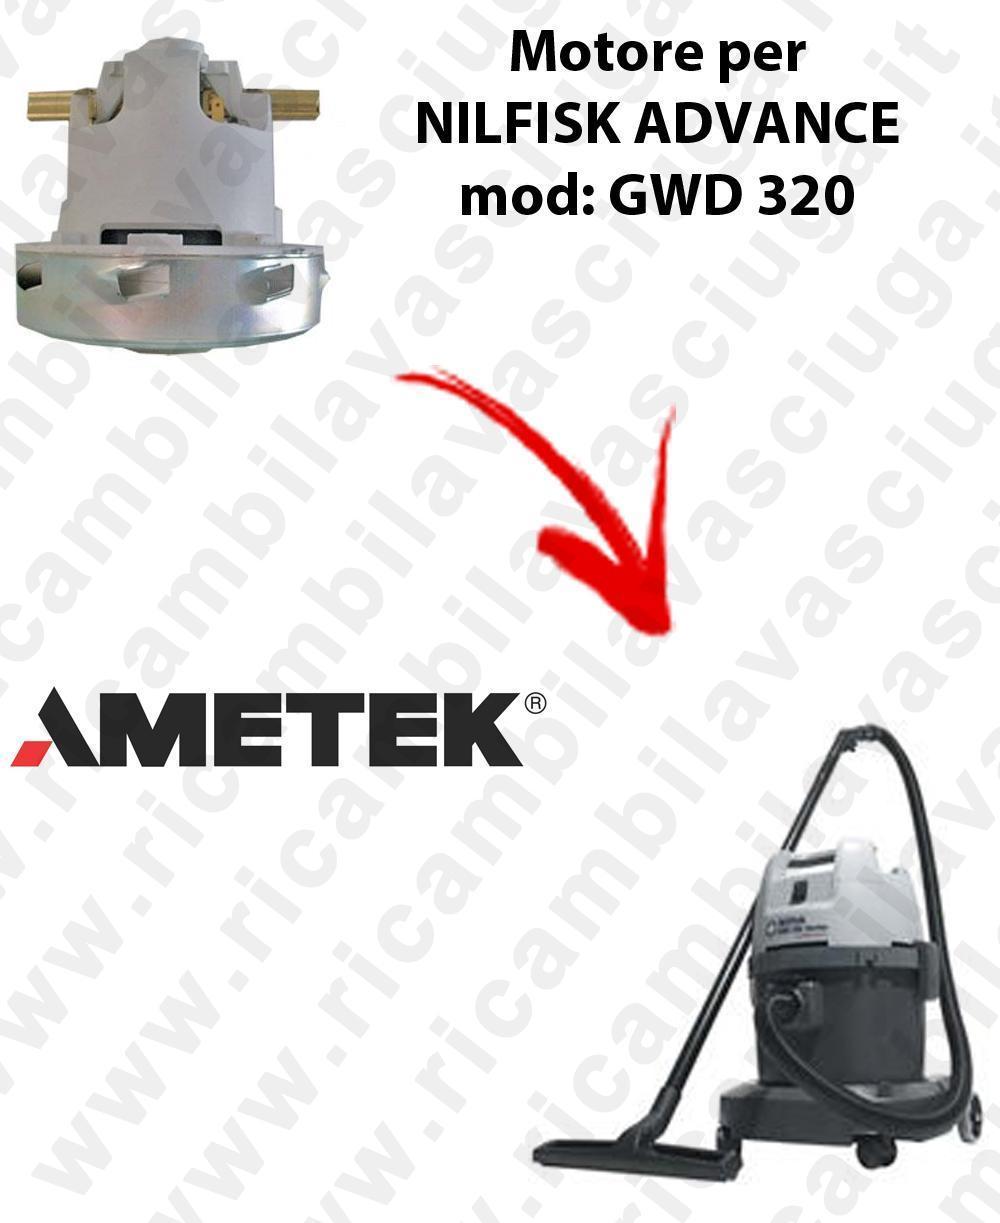 GWD 320 MOTEUR AMETEK aspiration pour aspirateur NILFISK ADVANCE